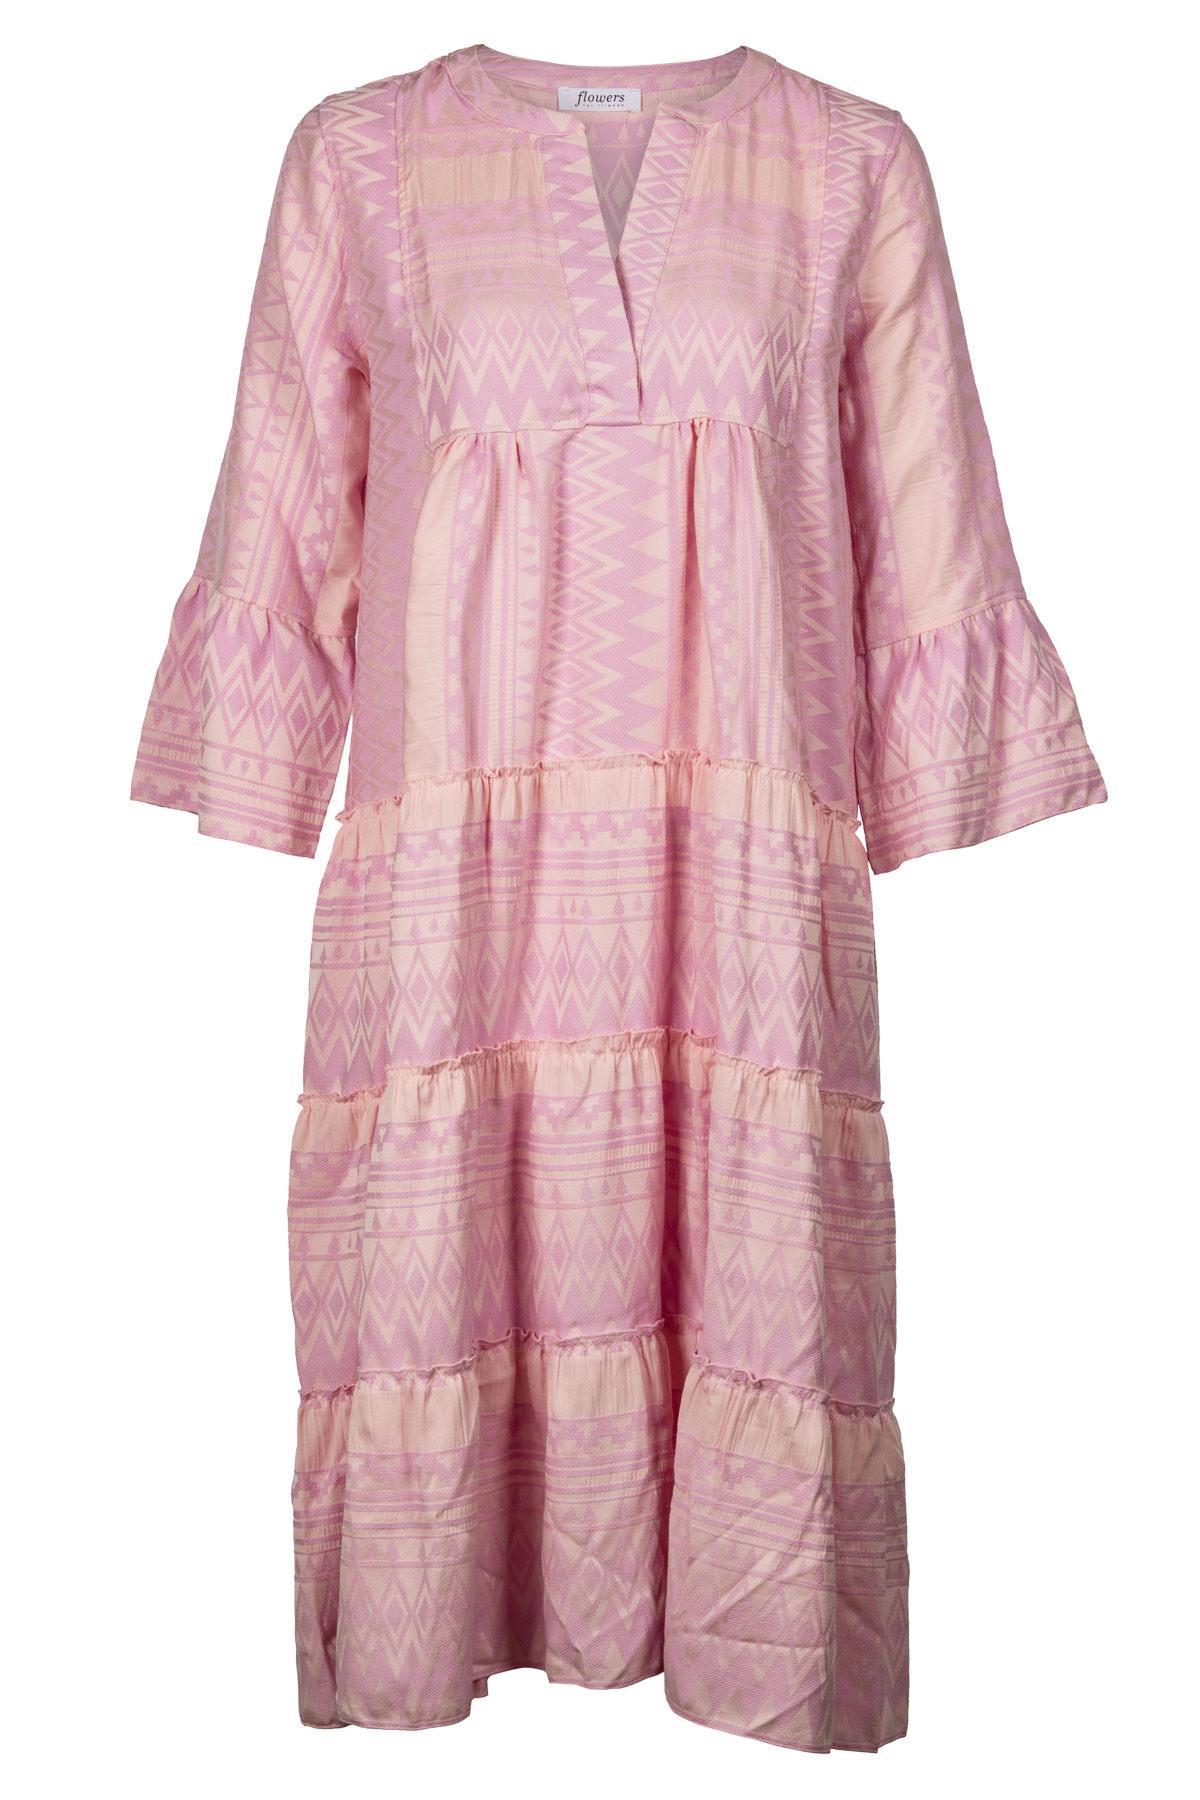 Damen Tunika Midikleid  Kleider  Kleider  Röcke